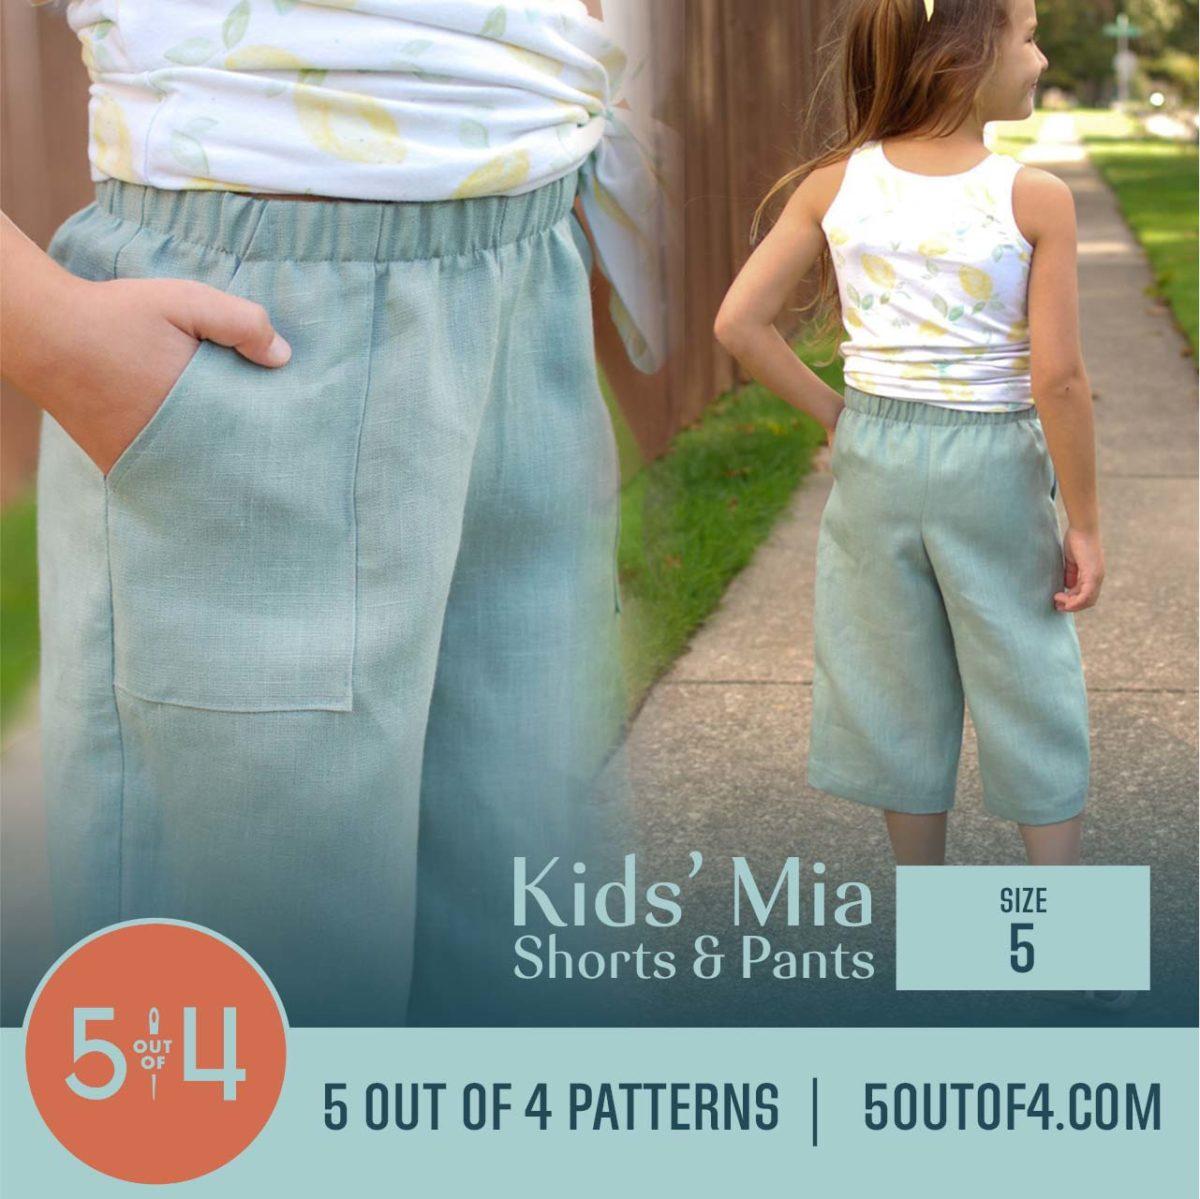 5oo4 Patterns Kids' Mia Pants Size 5